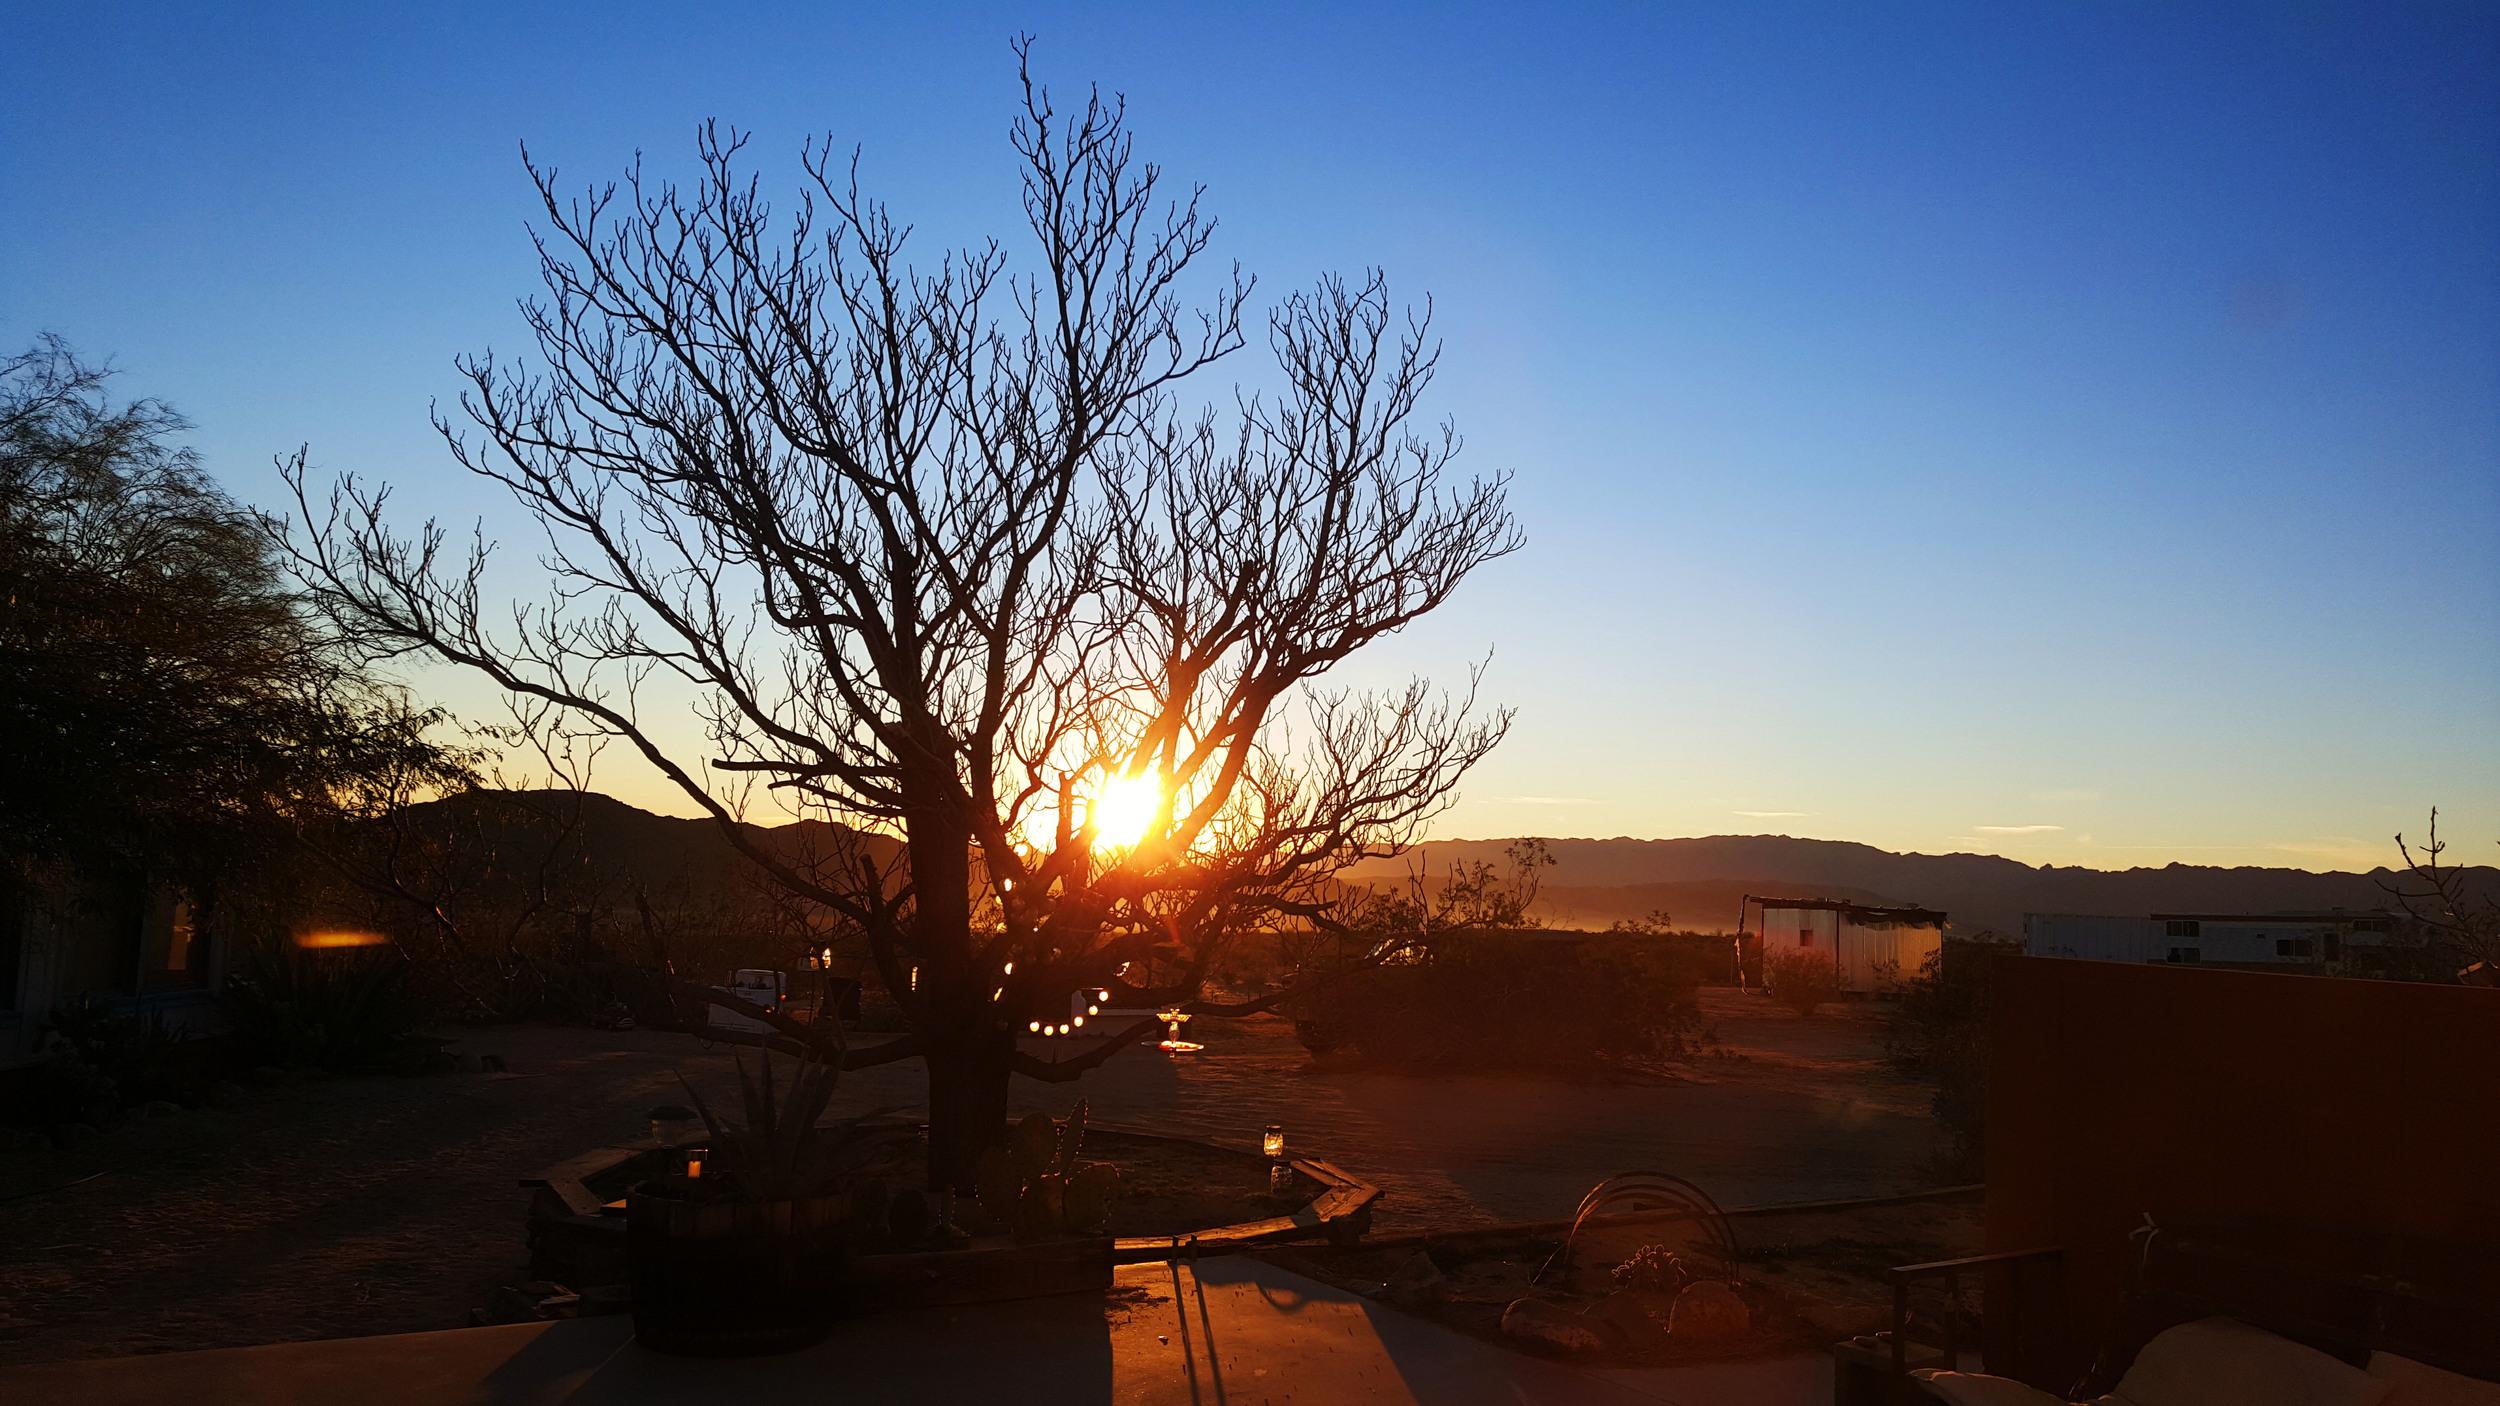 Desert sunrise in Joshua Tree, CA